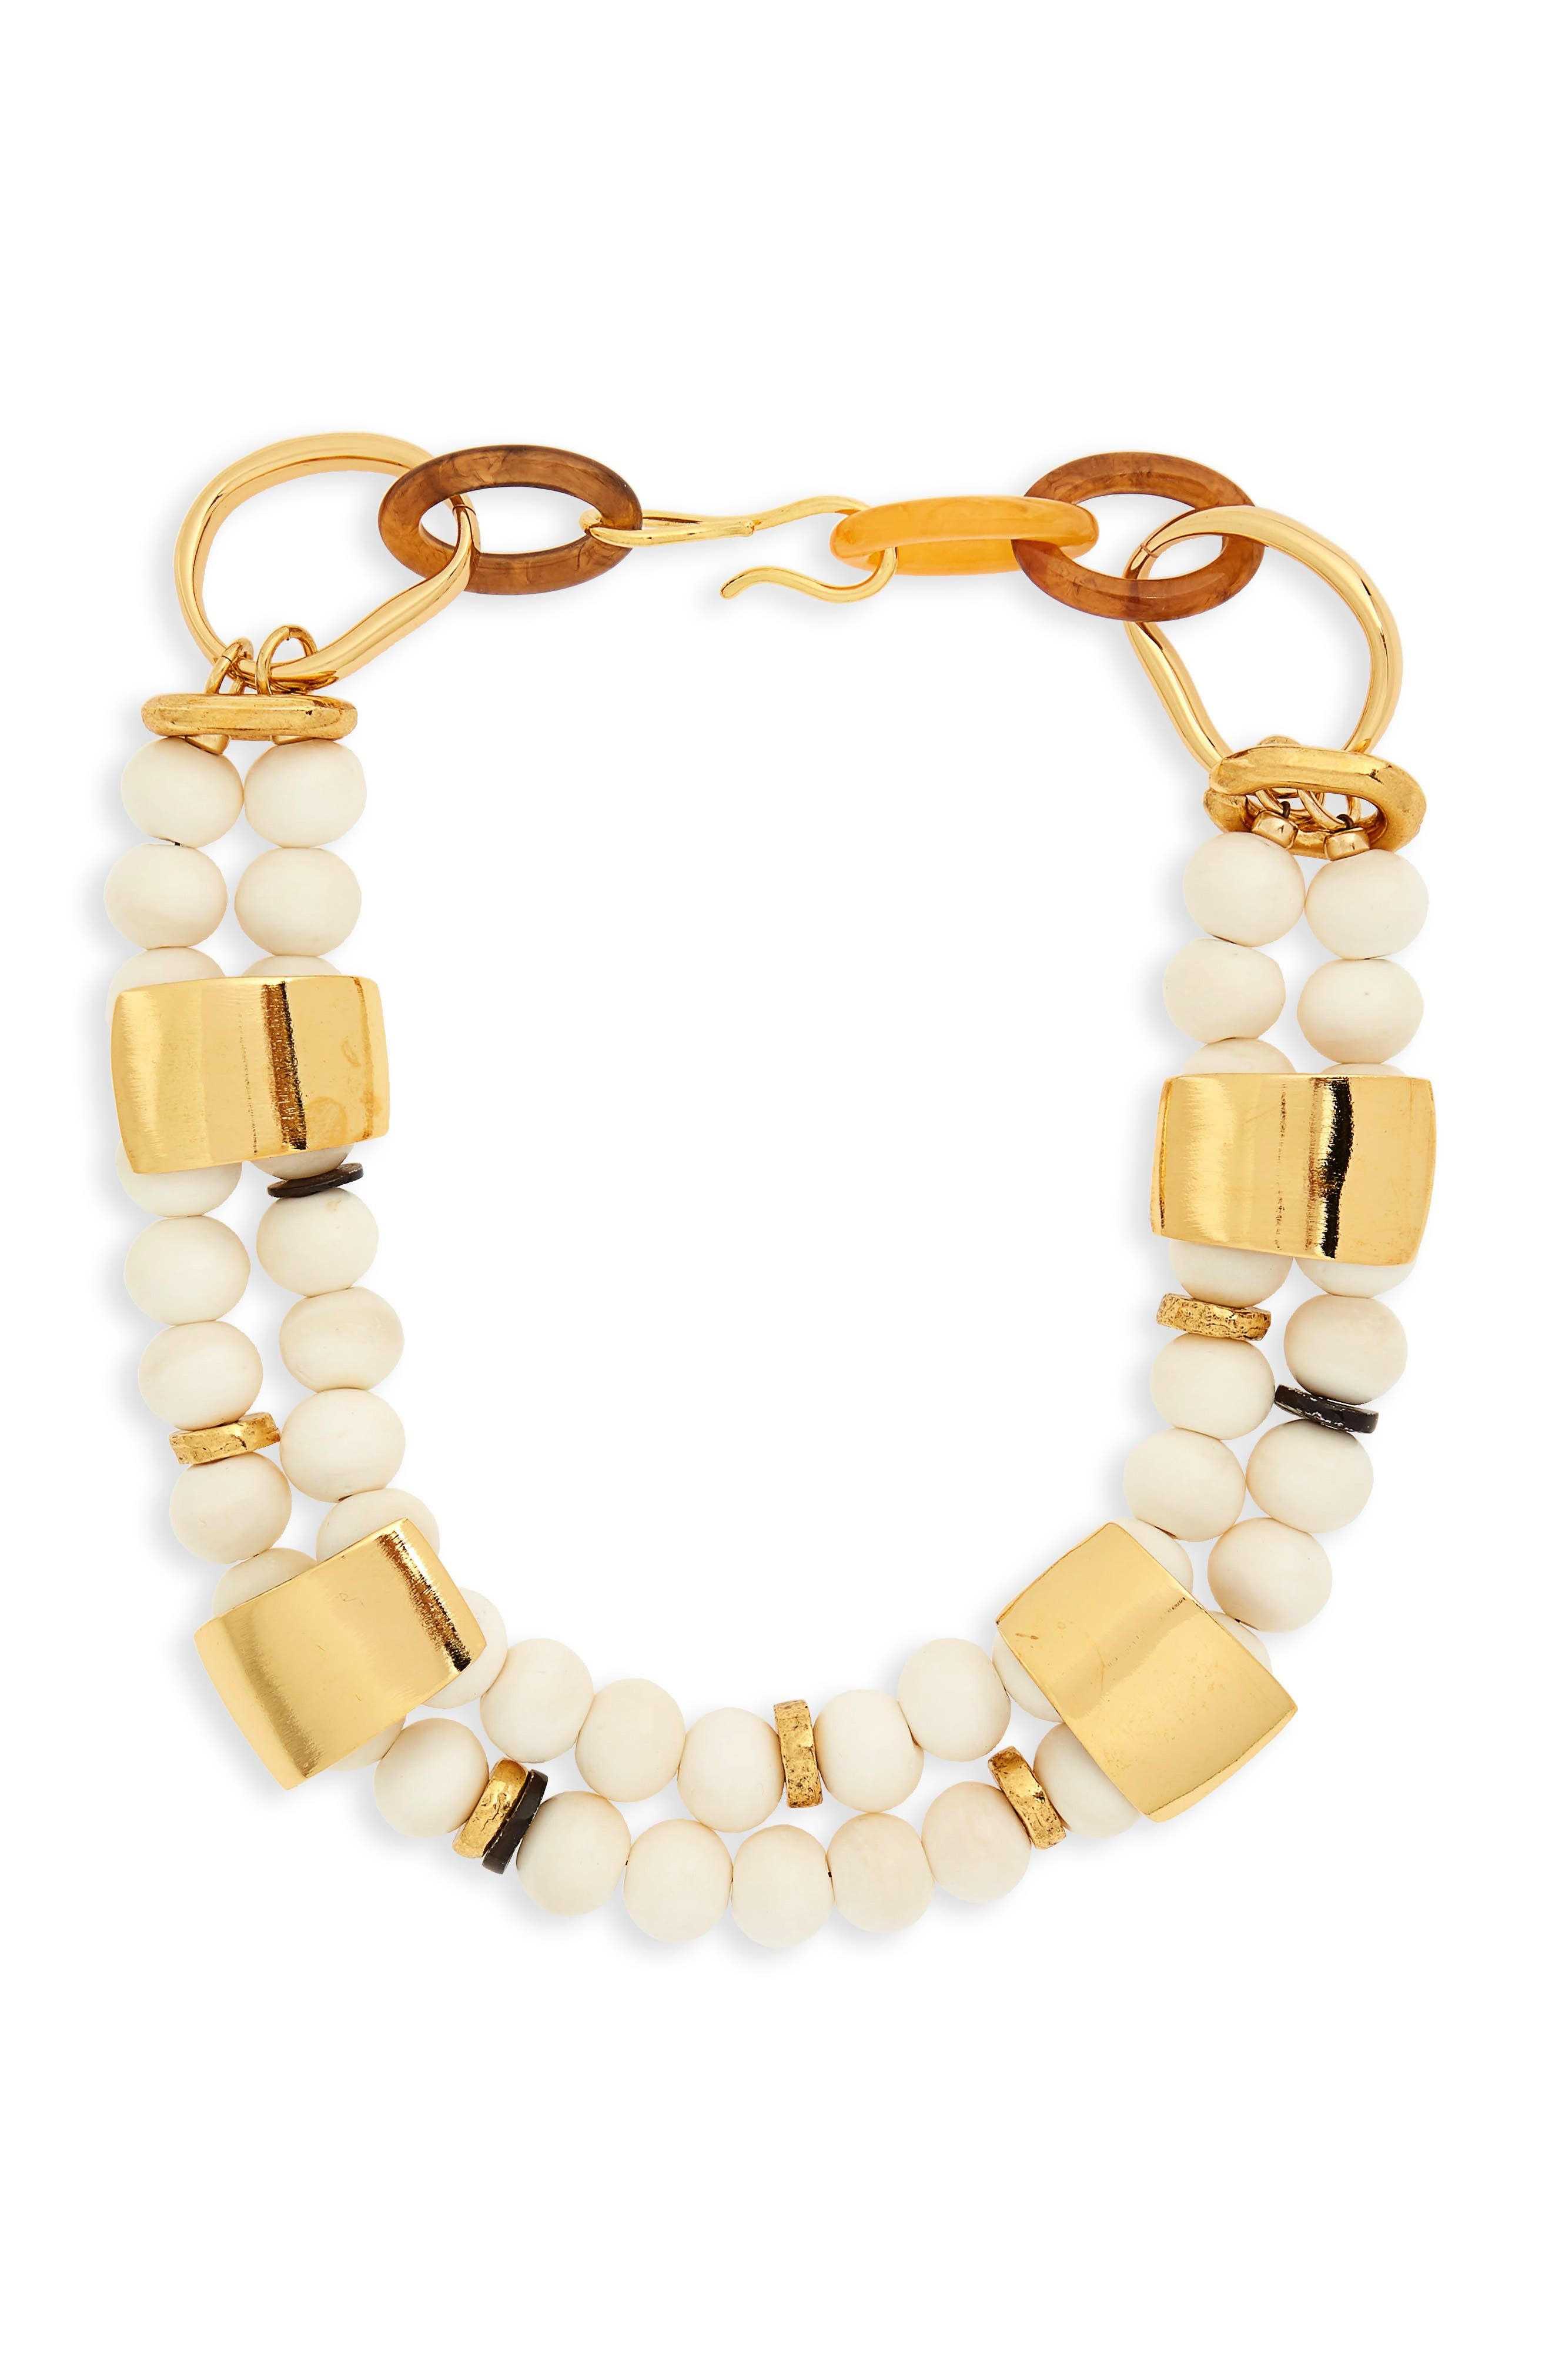 Reflection Collar Necklace,                             Main thumbnail 1, color,                             900